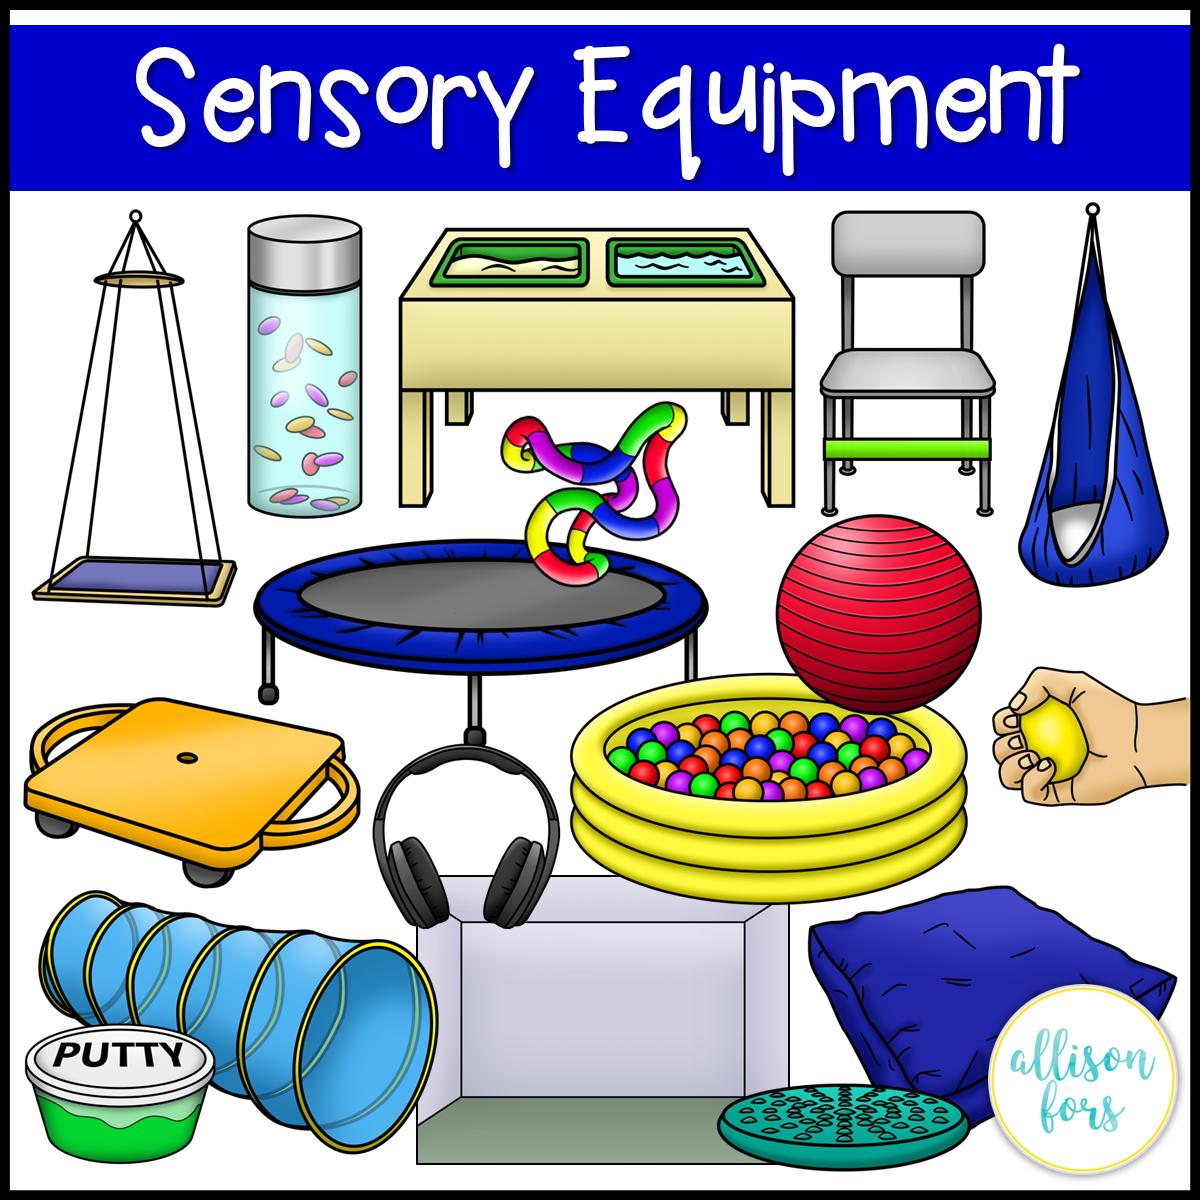 Sensory clipart image transparent library Sensory Room Equipment Clip Art | Allison Fors Educational ... image transparent library